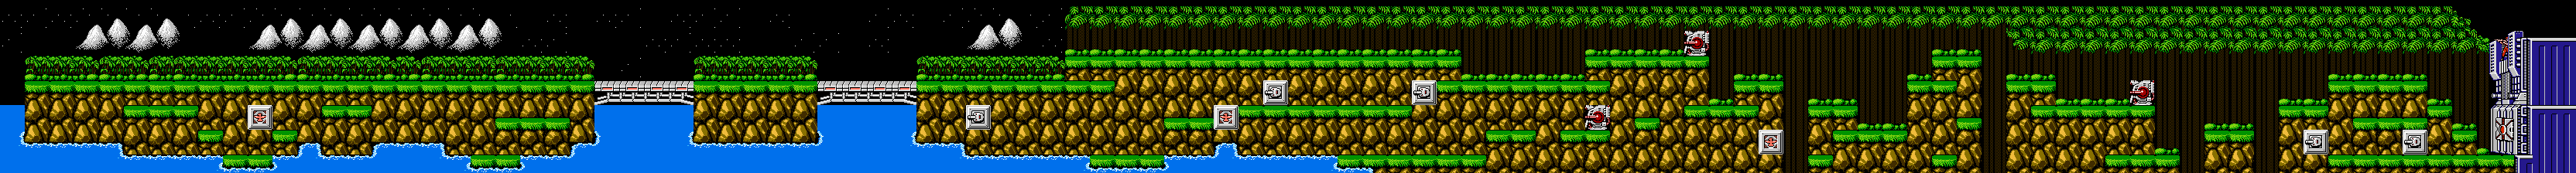 Contra-Stage1-Jungle